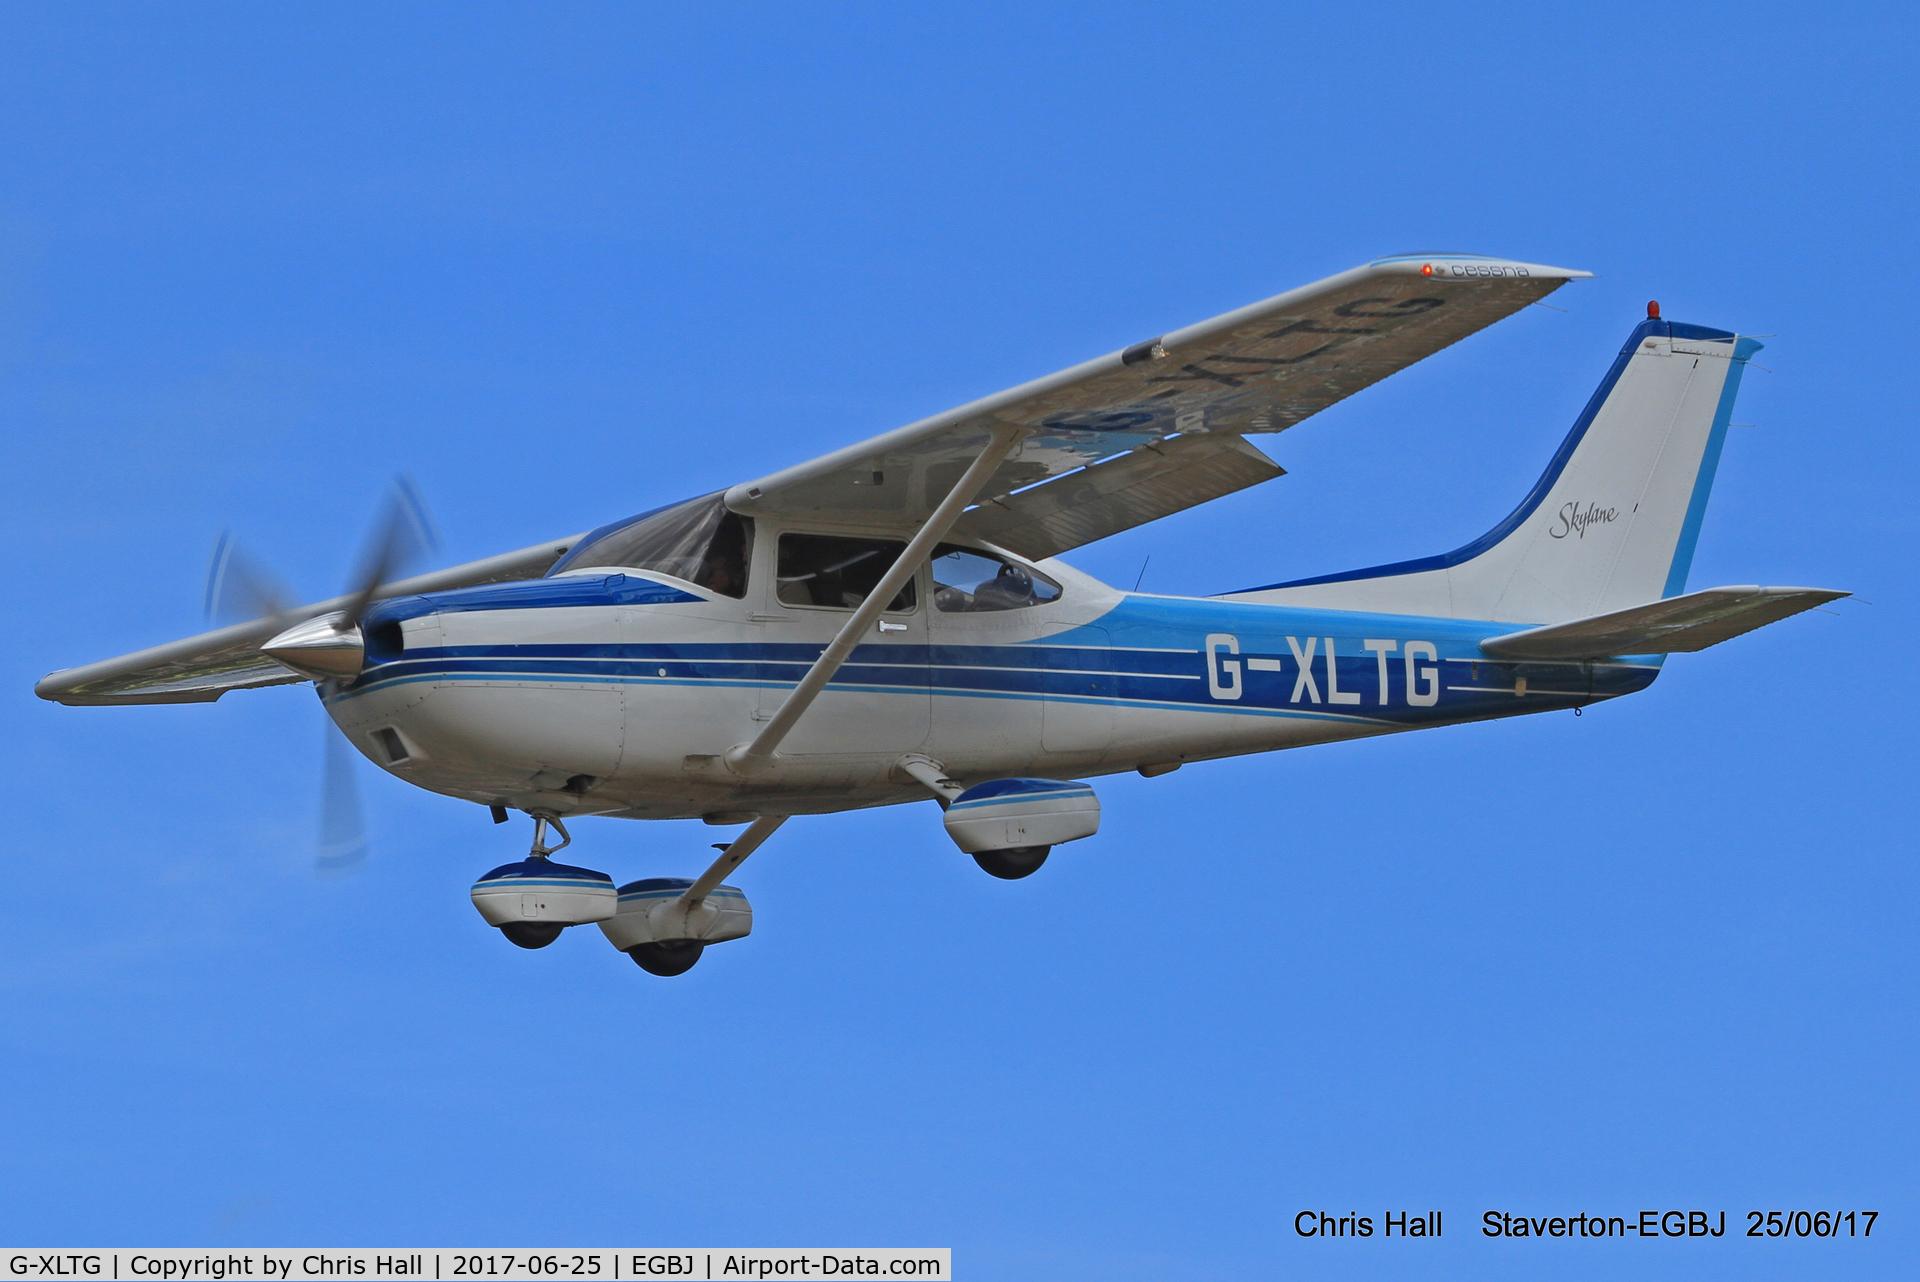 G-XLTG, 1998 Cessna 182S Skylane C/N 182-80234, Project Propeller at Staverton